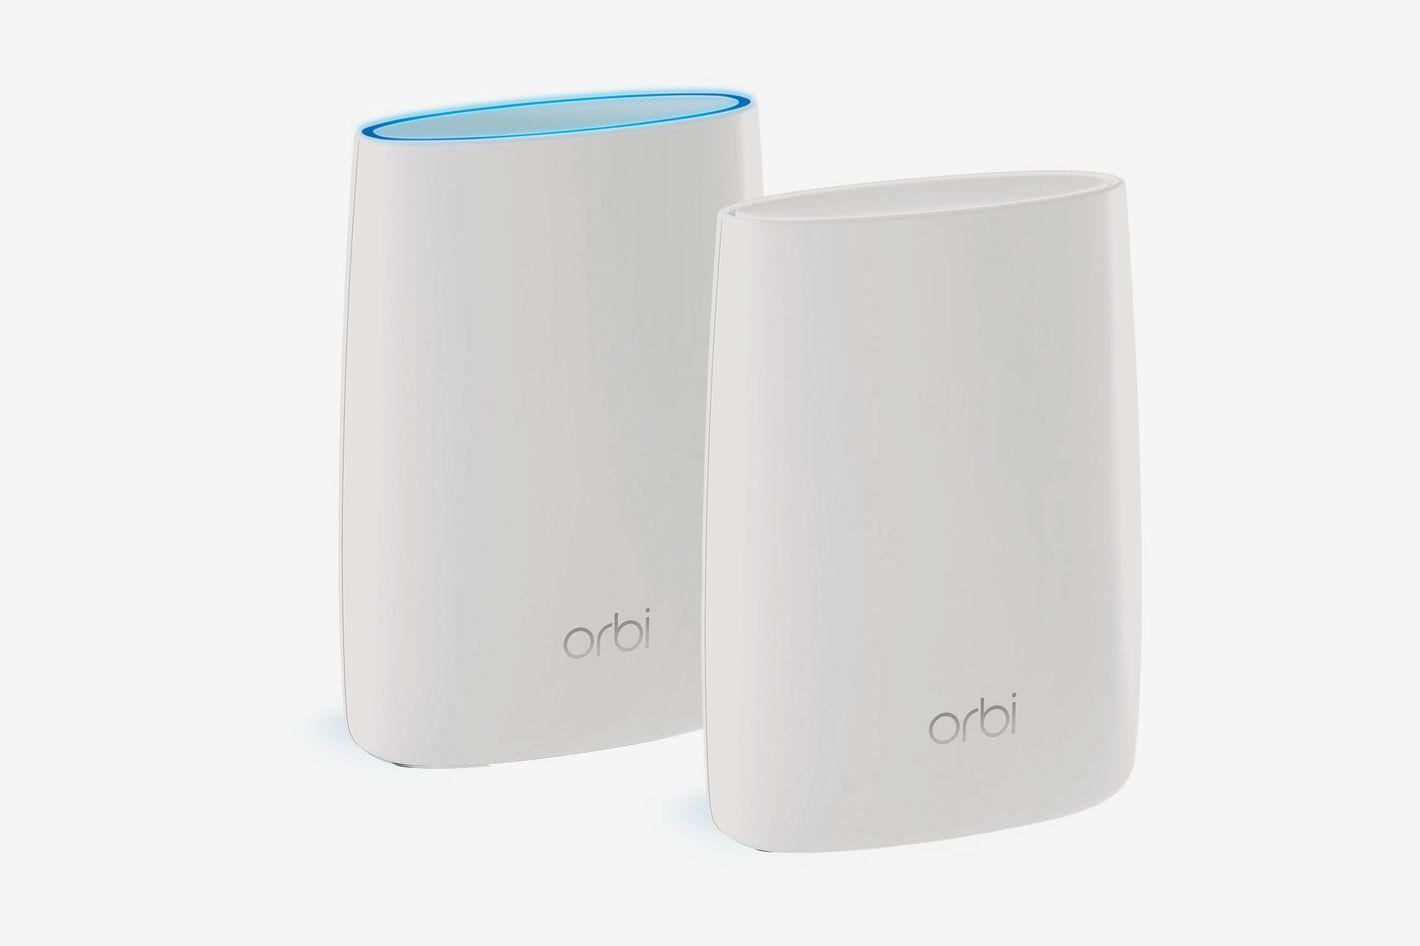 Netgear Orbi Home Mesh WiFi System